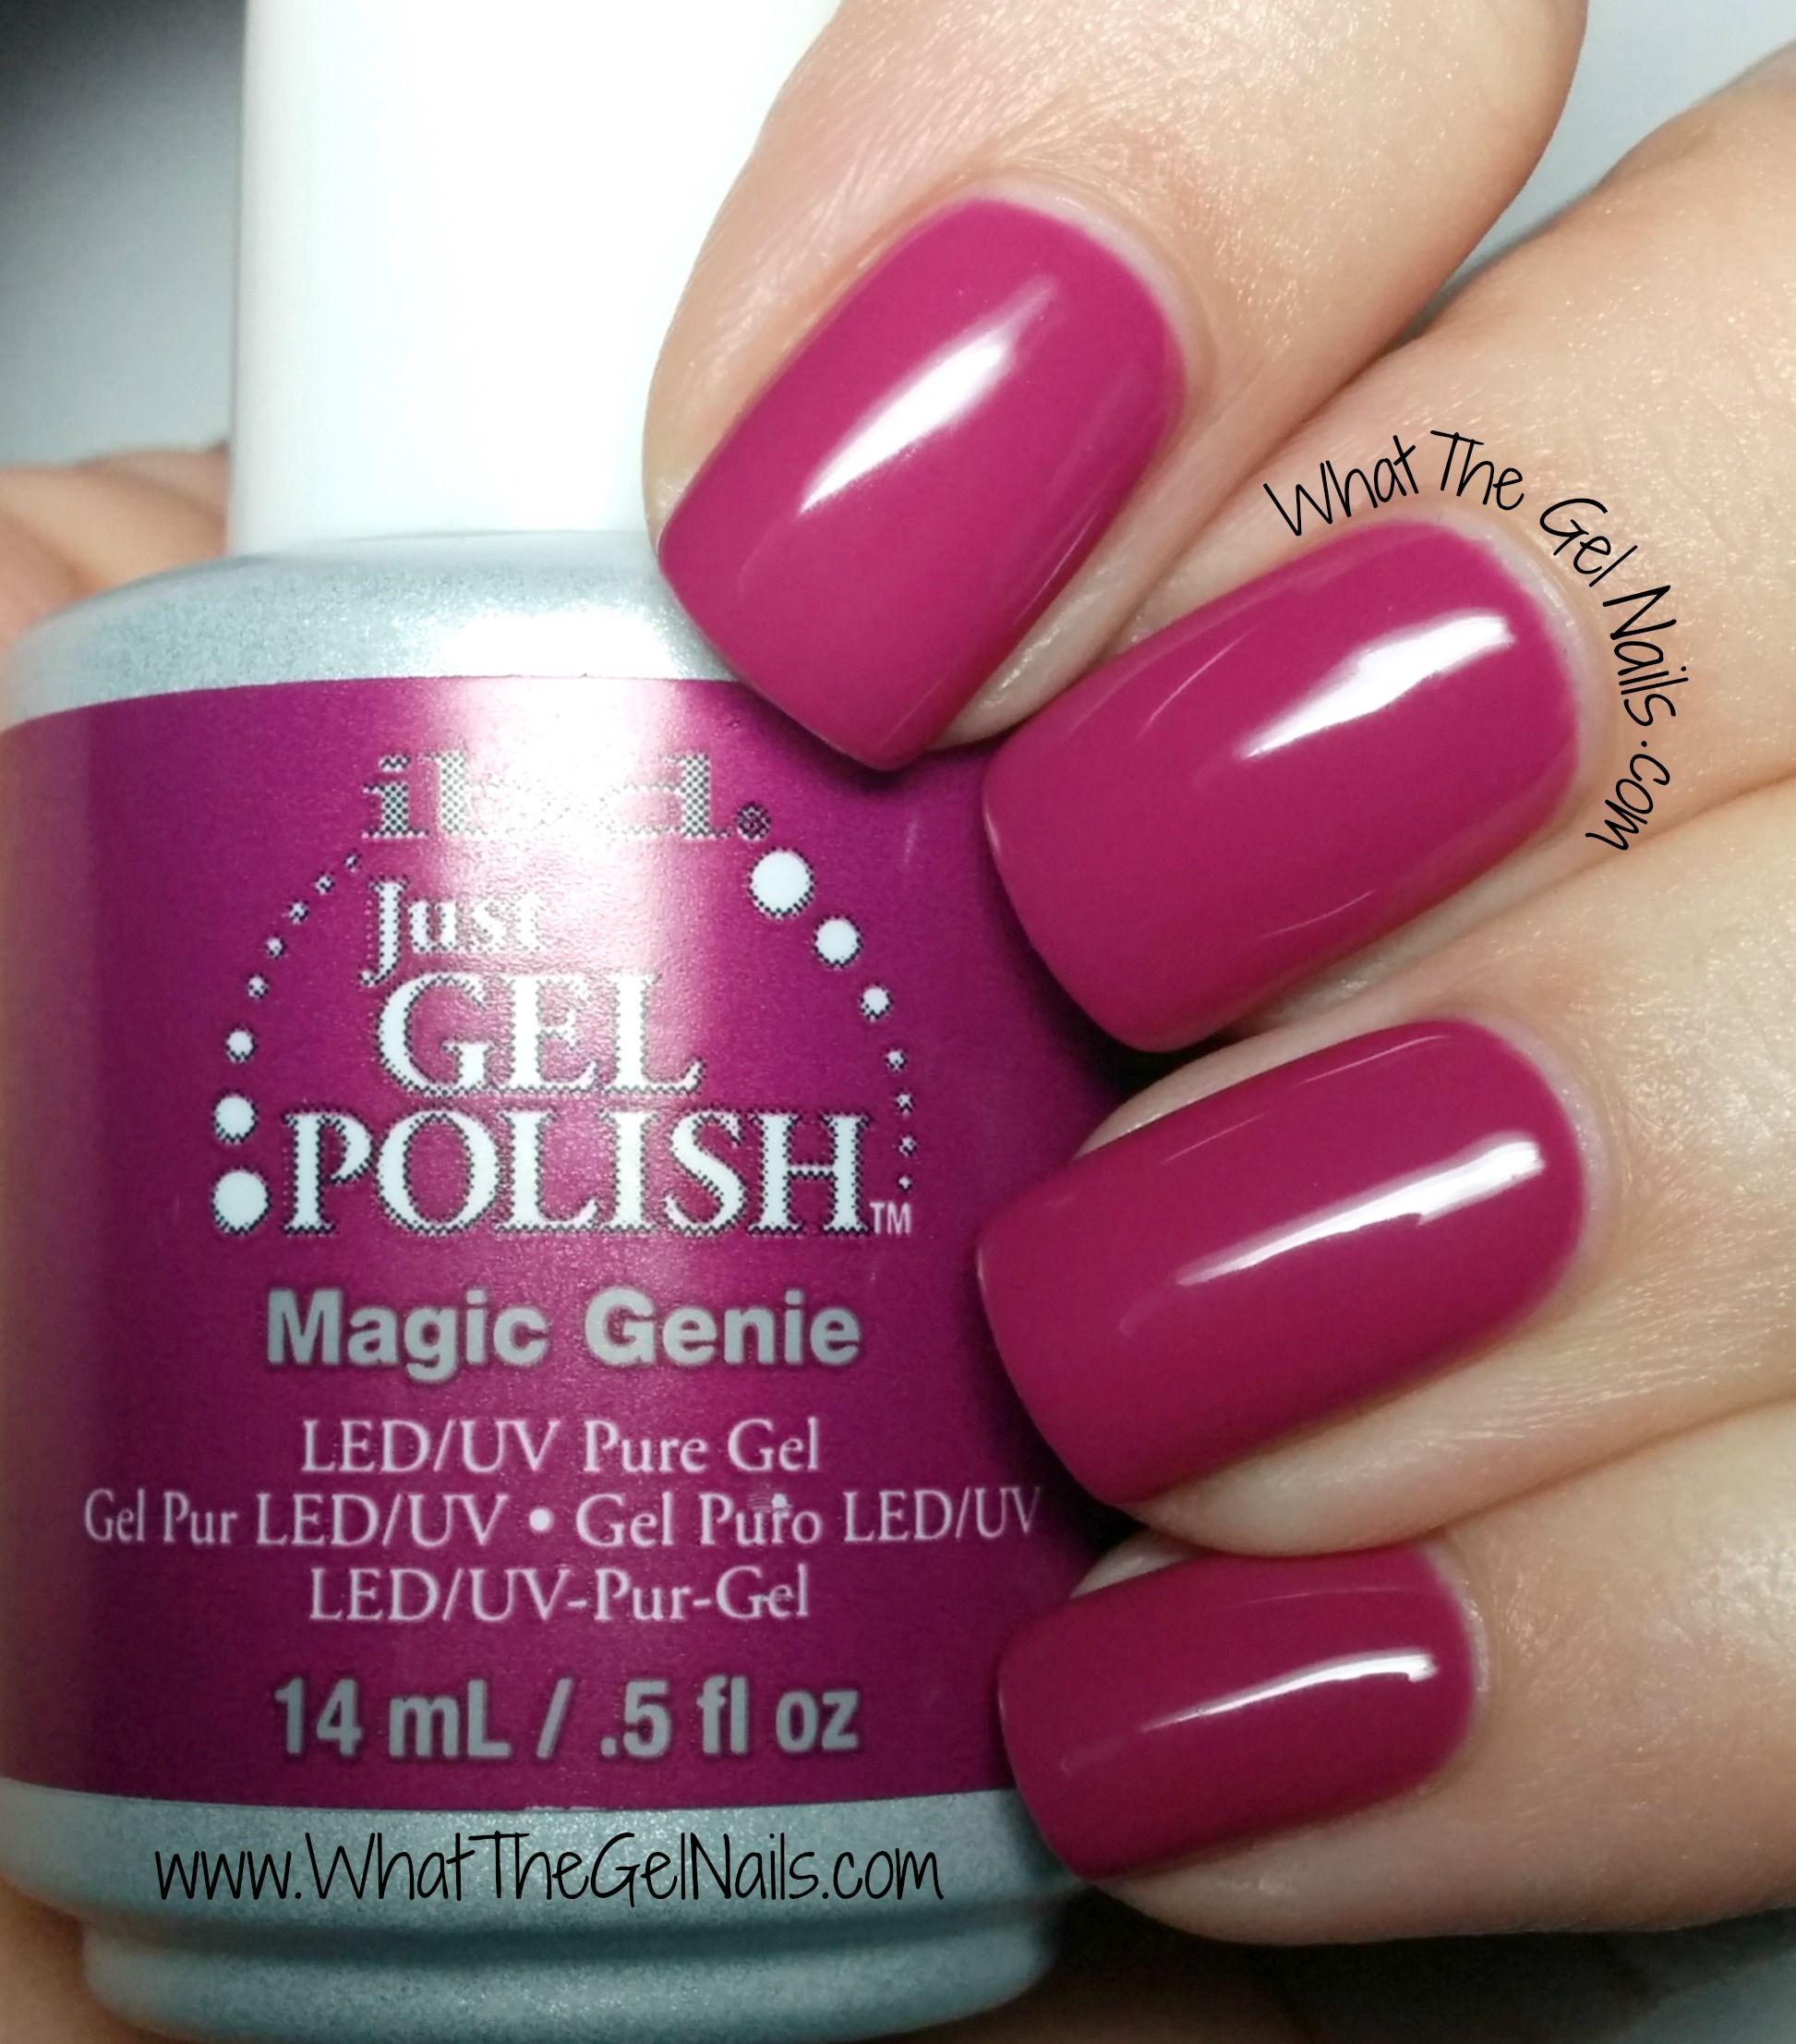 Ibd Magic Genie | Nail Colors | Pinterest | Uv led, Manicure and Gel ...